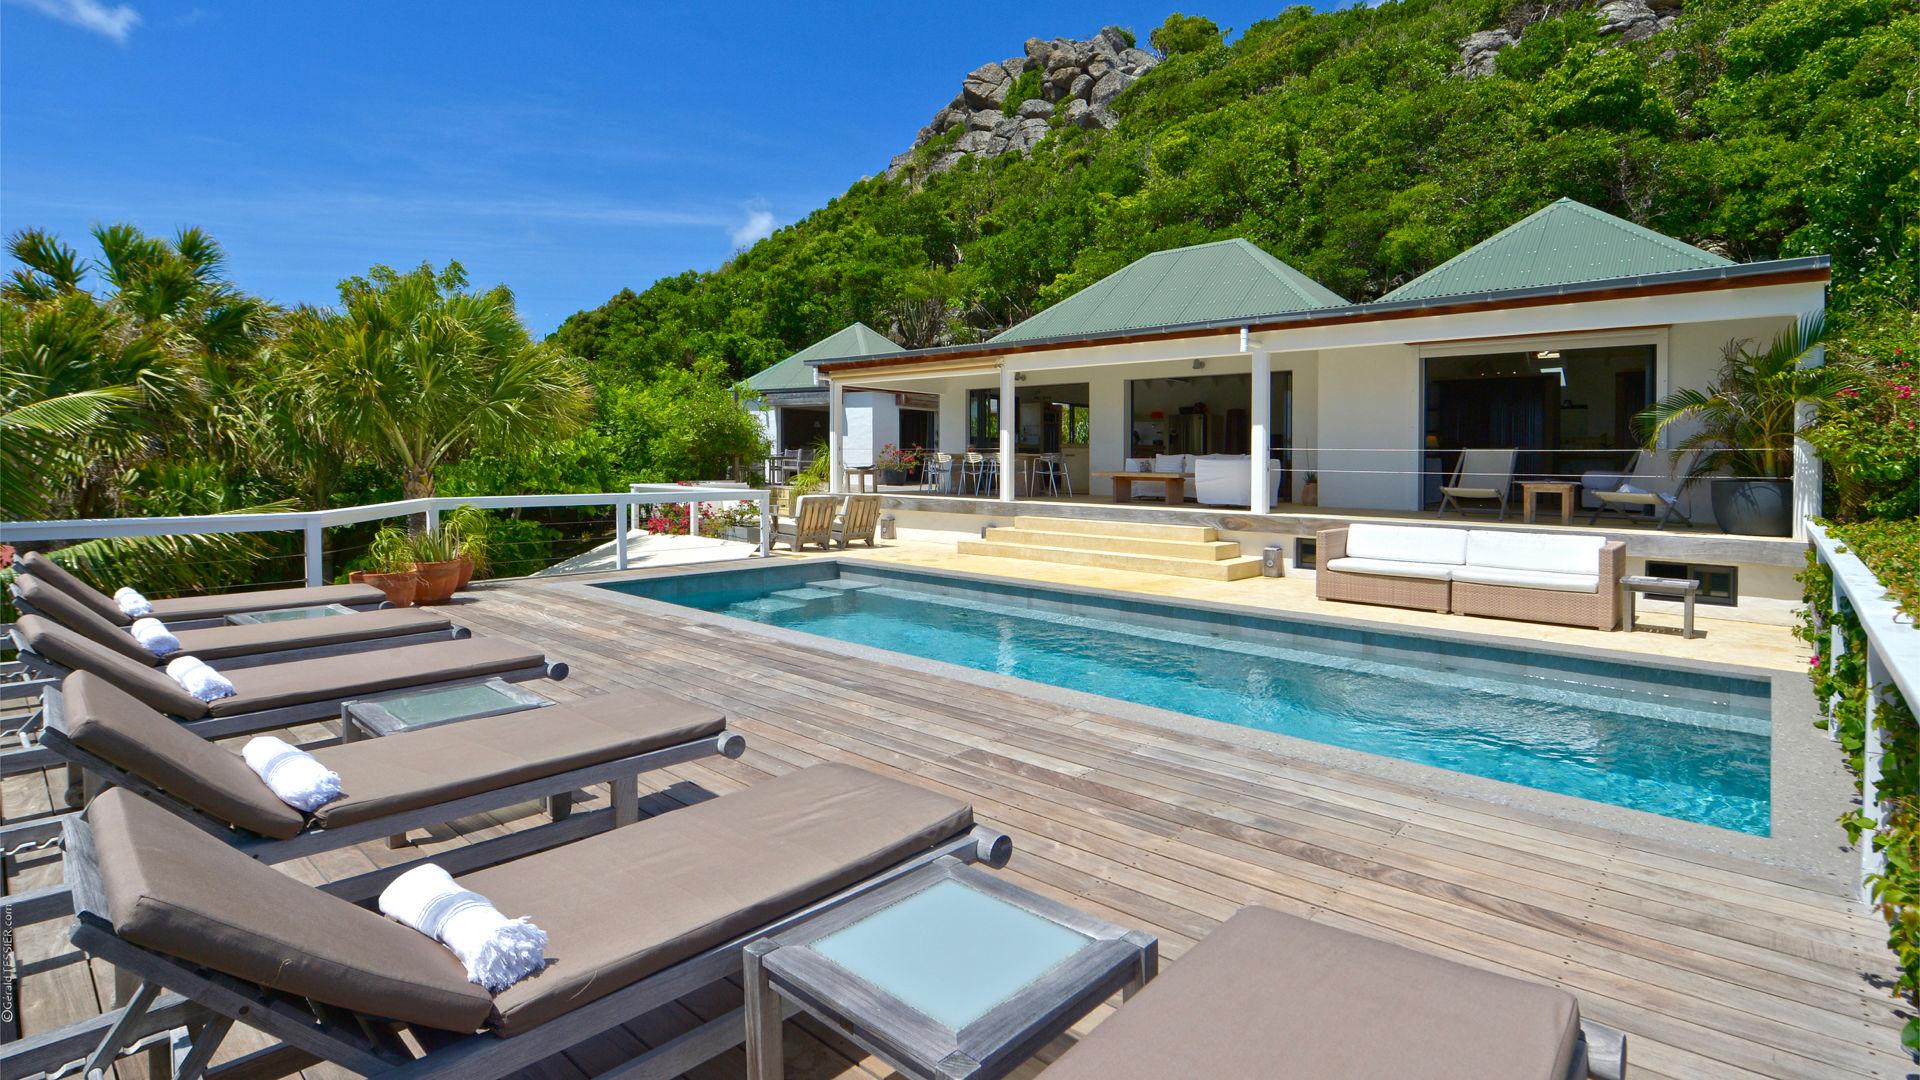 Luxury villa rentals caribbean - St barthelemy - Anse des cayes - Jali - Image 1/20